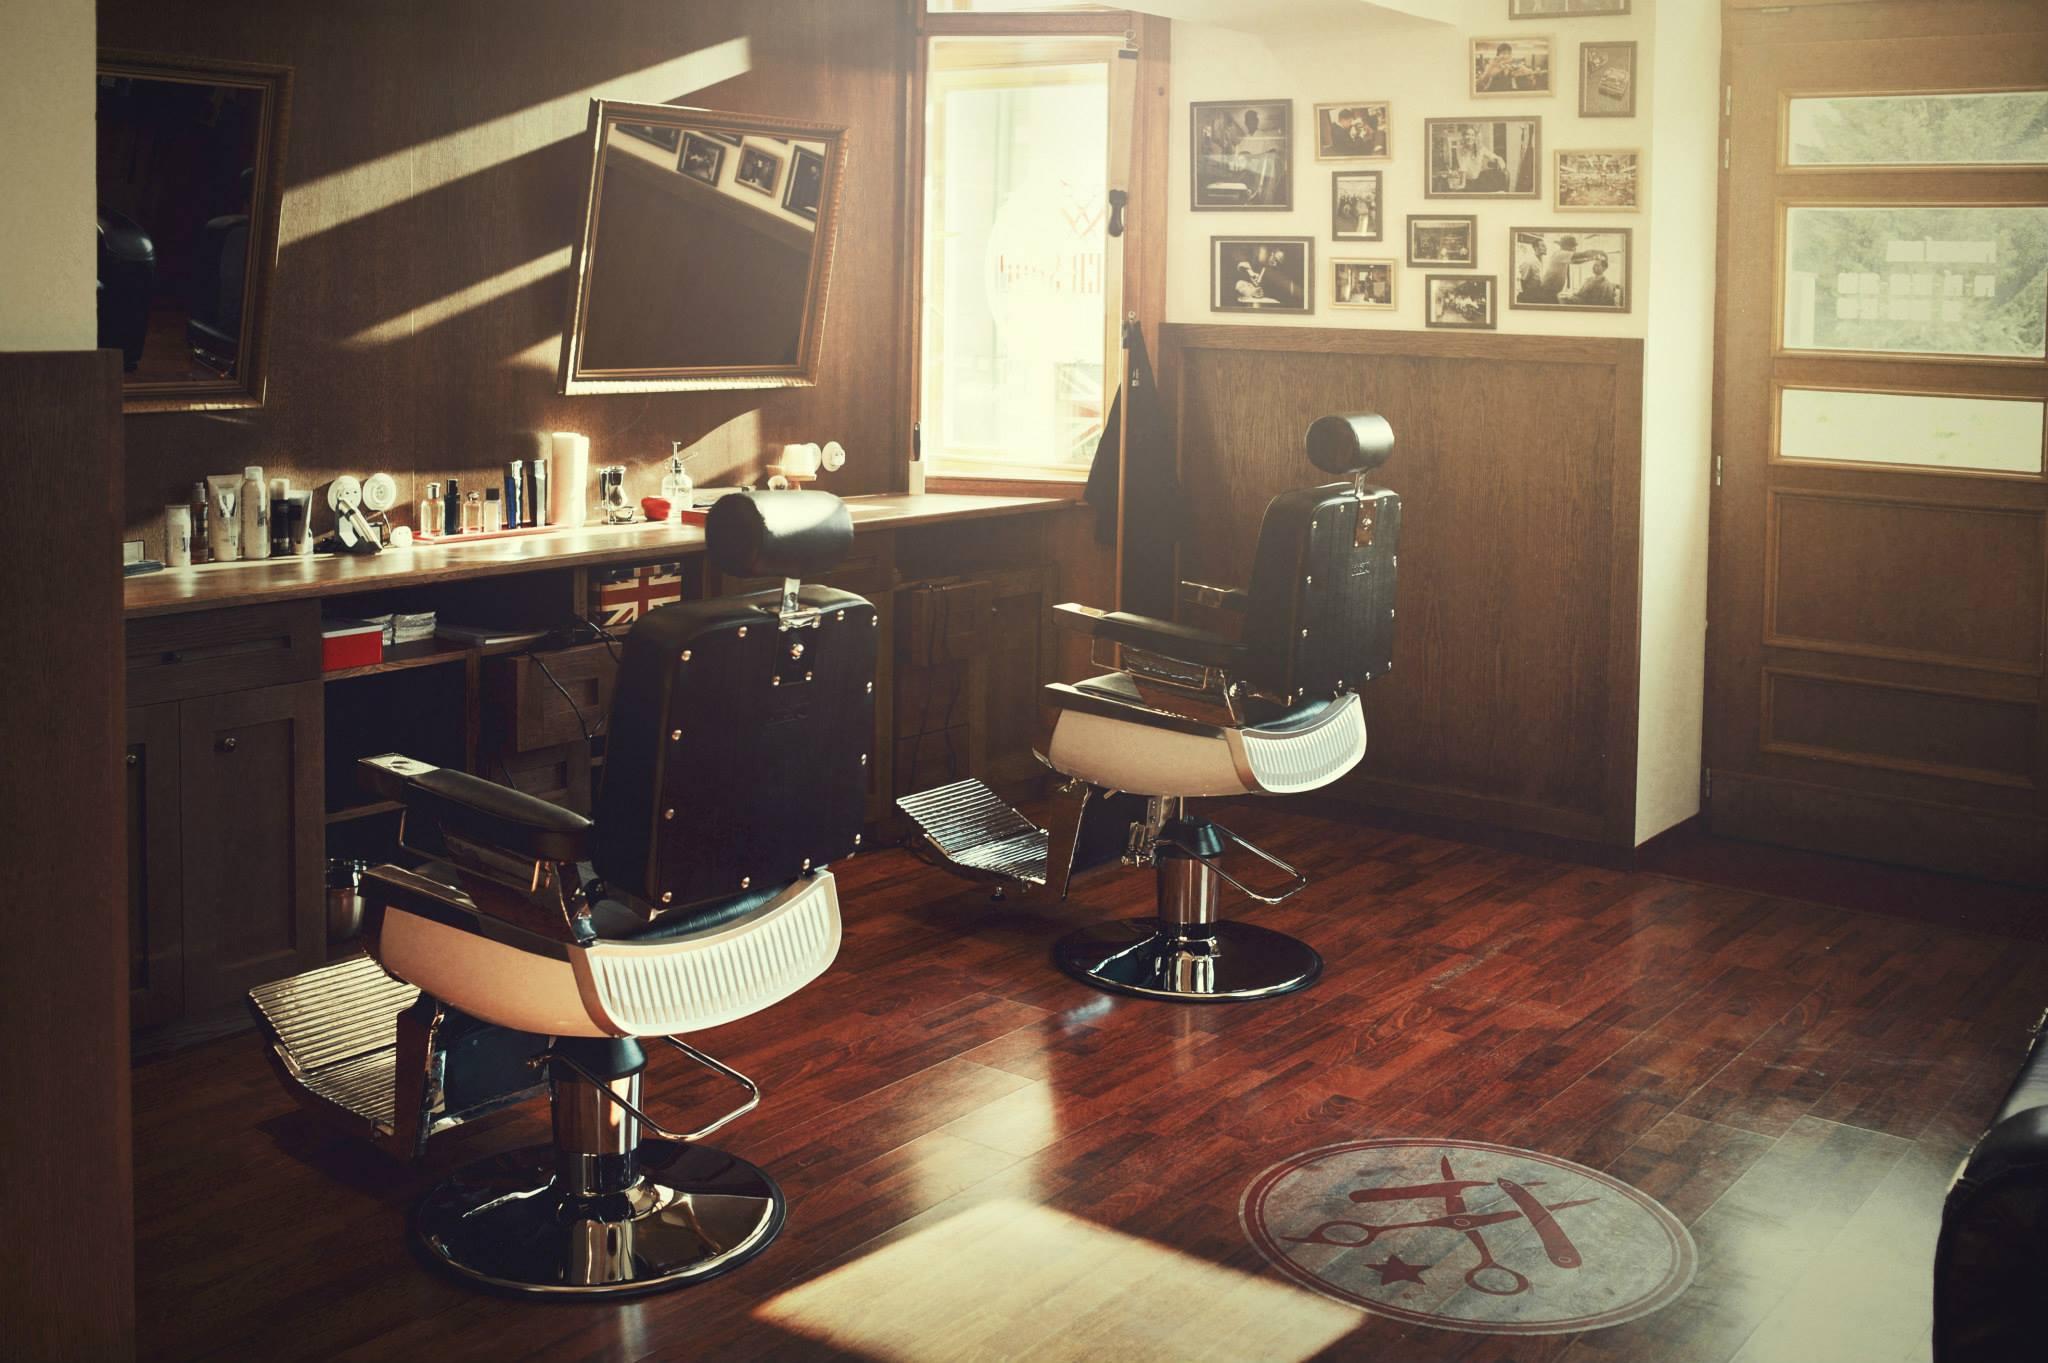 Barber shop Cooper, Jihlava